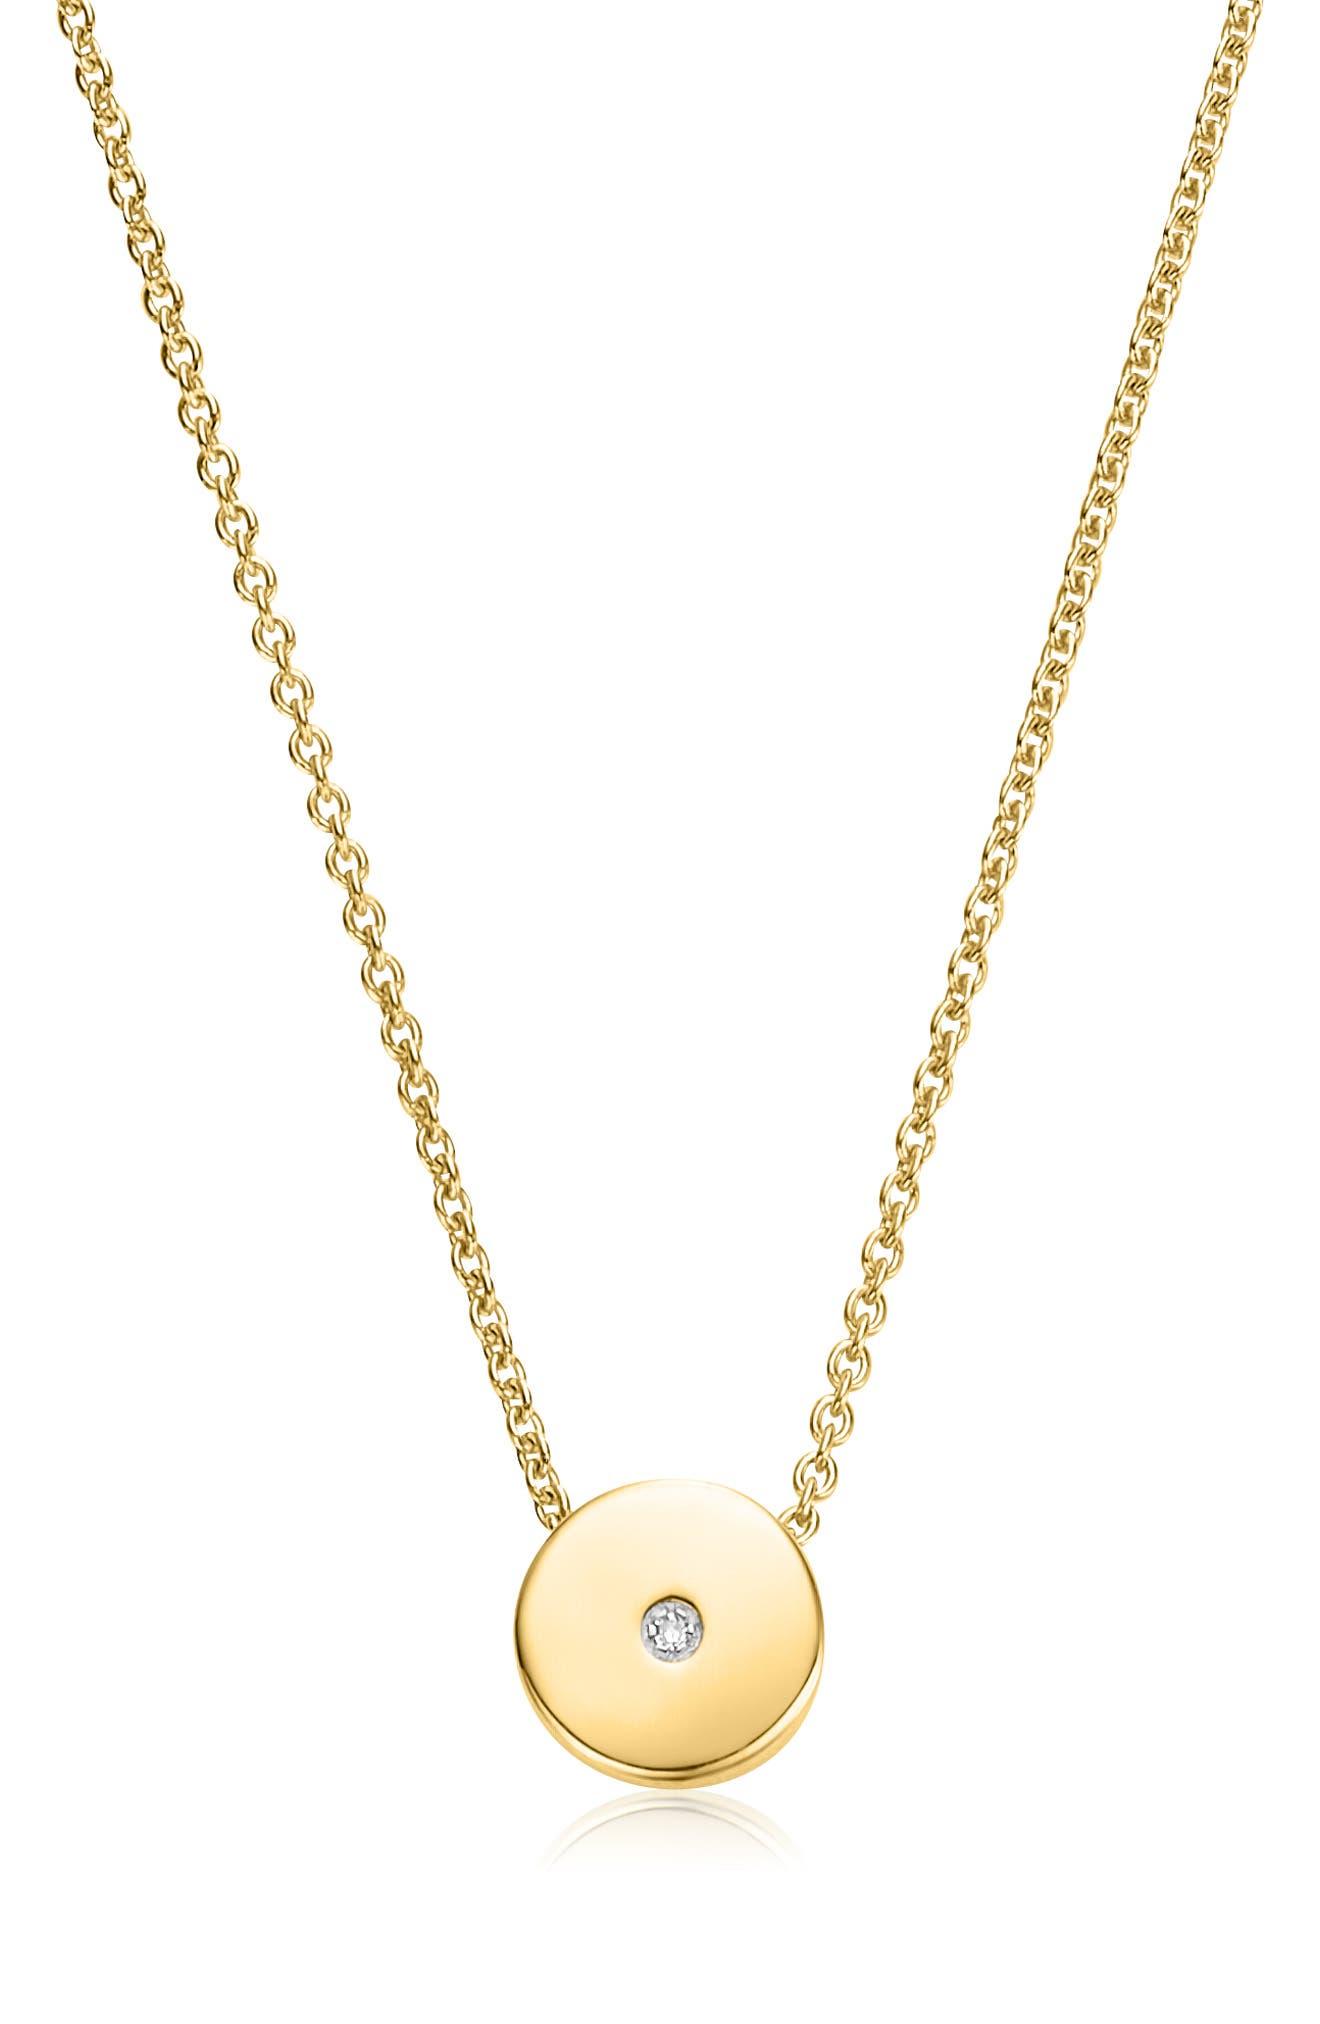 MONICA VINADER, Linear Solo Diamond Pendant Necklace, Main thumbnail 1, color, GOLD/ DIAMOND